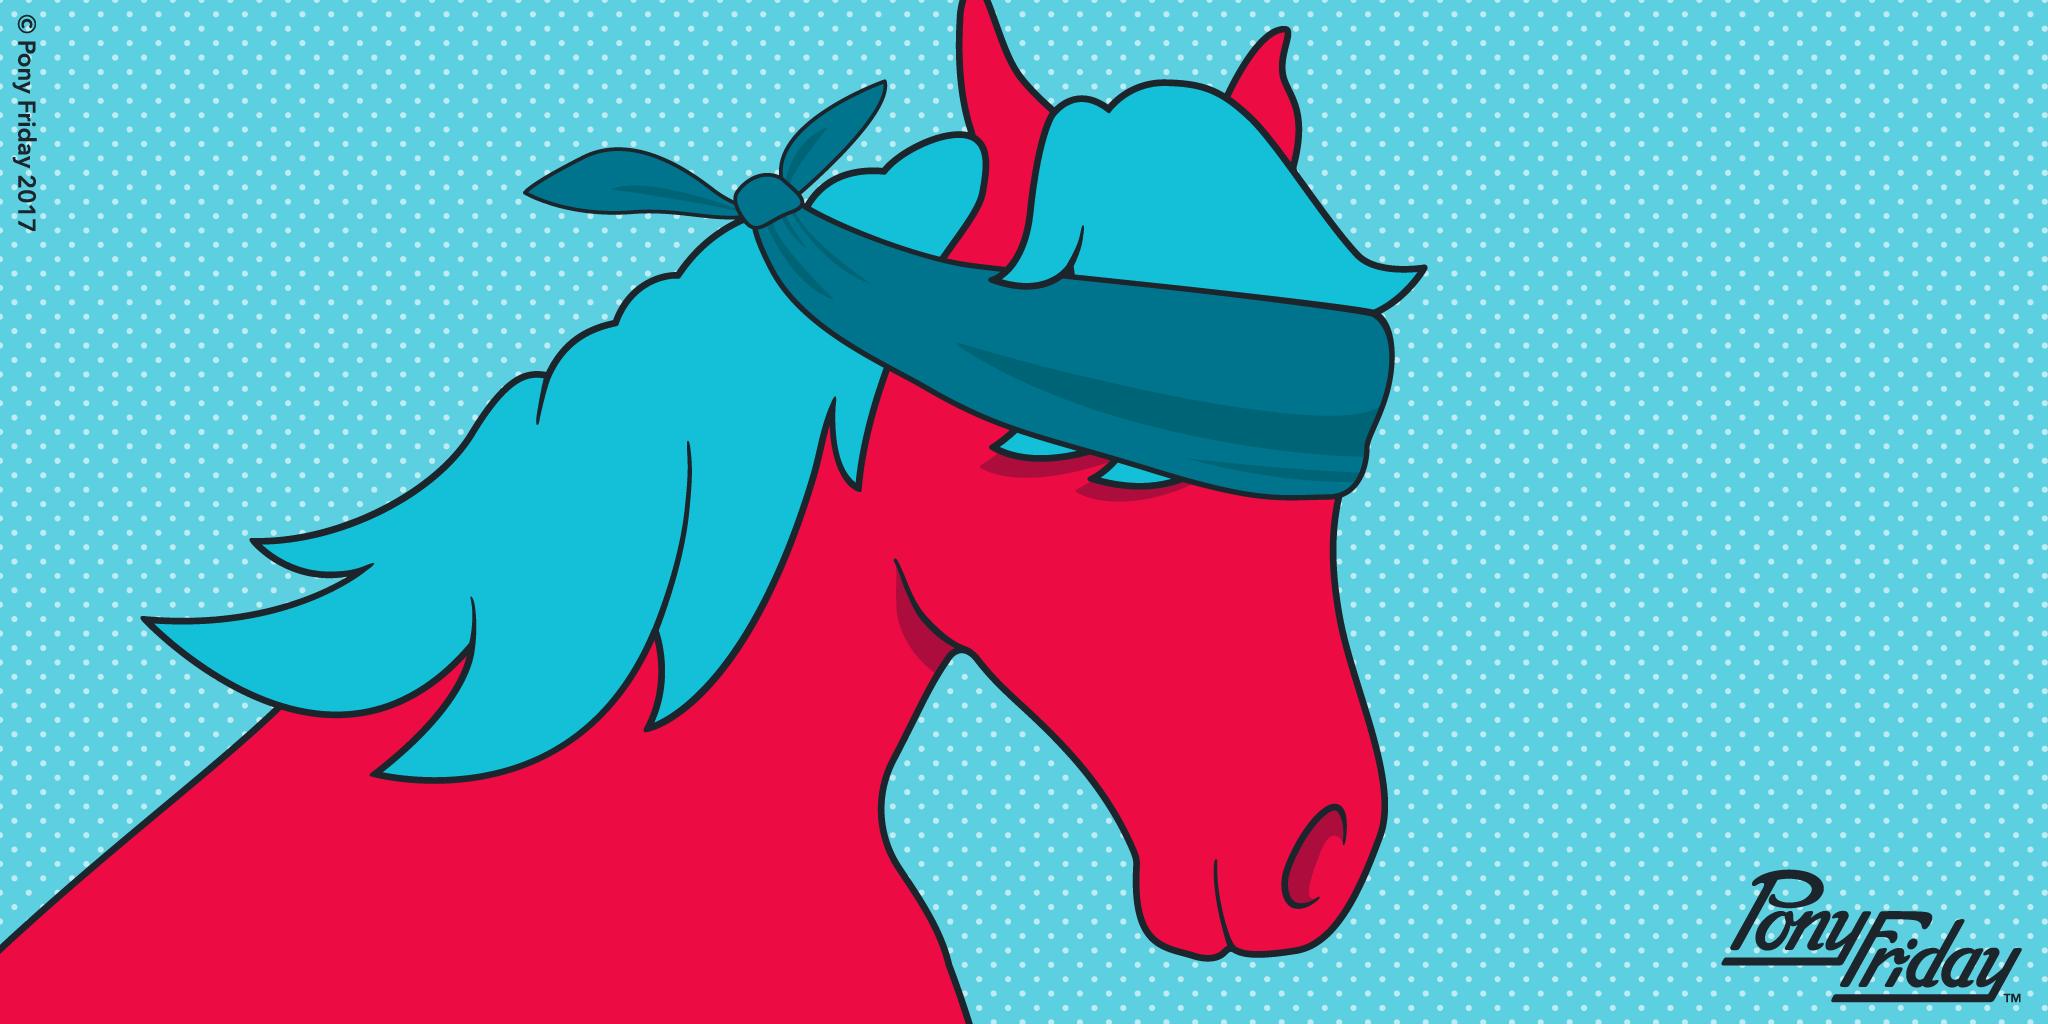 Pony-Friday-Blind-Fold-Journey-Pin-The-Tail-On-The-Donkey-Kicks-Blog-Header-Image.png